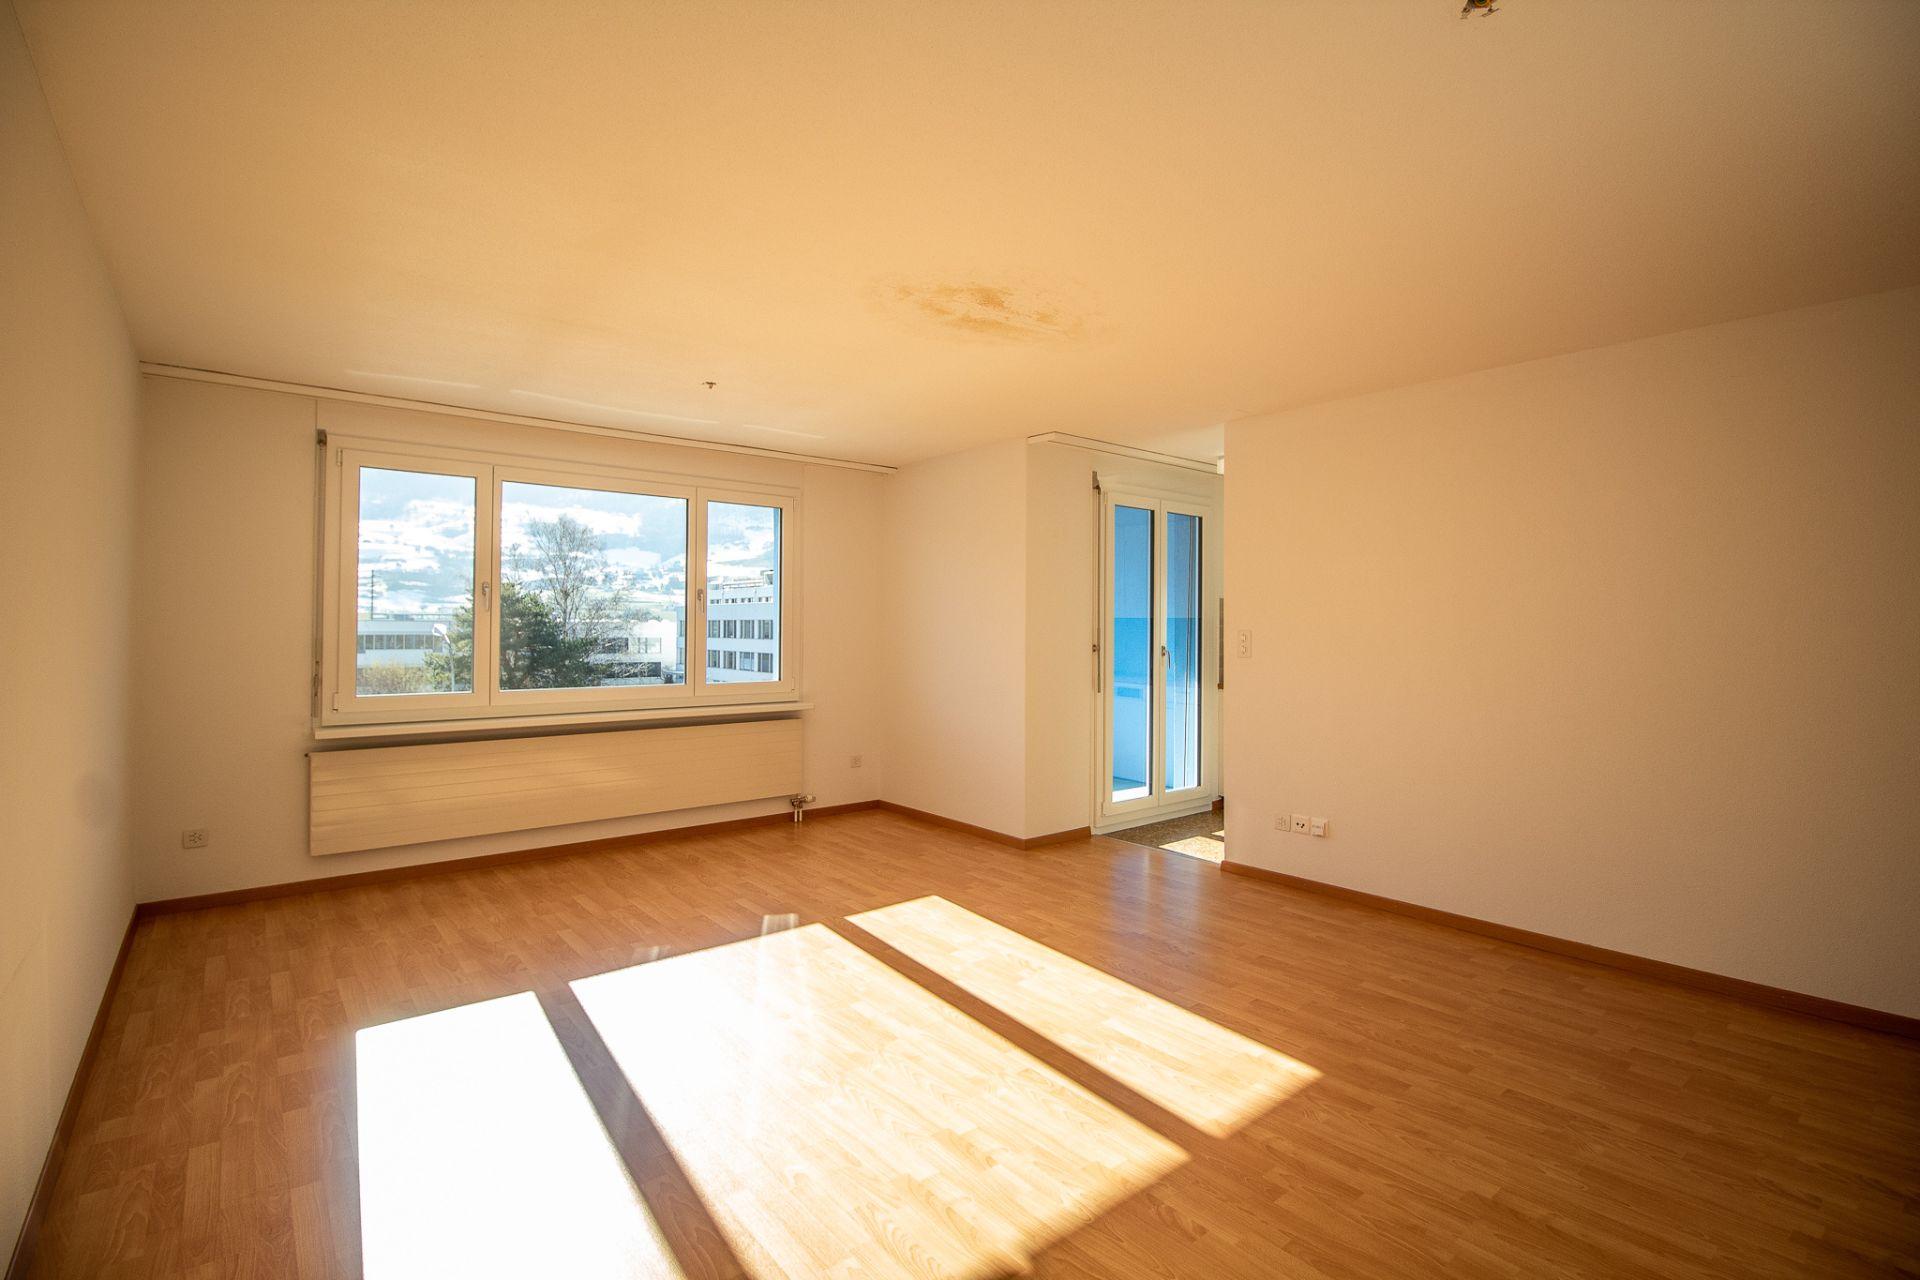 Miete: Single-Wohnung an Top-Lage